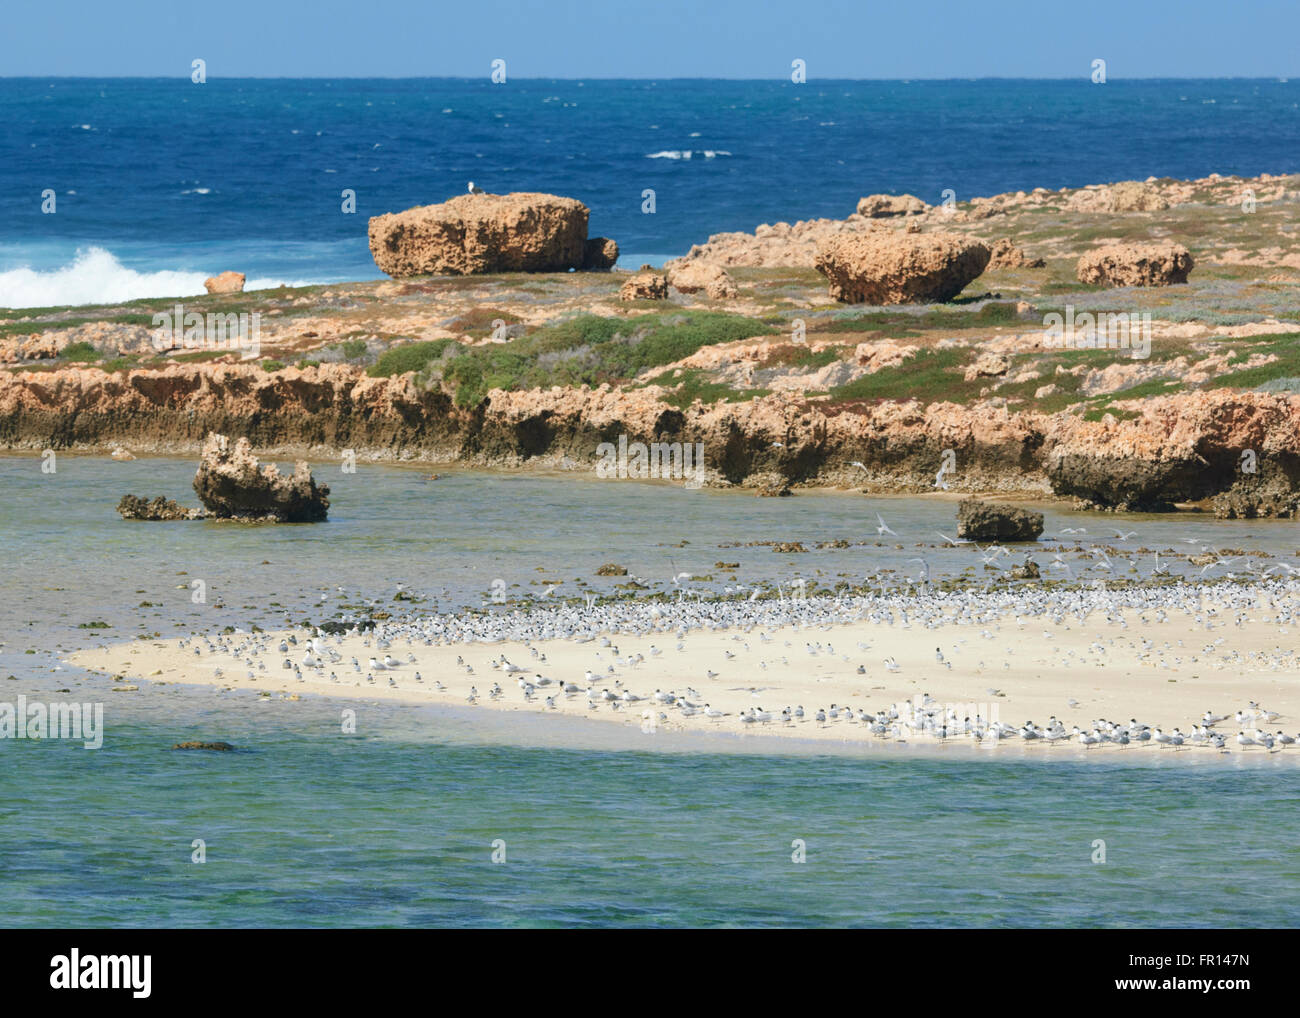 Seagulls on a Sand Bar, Red Bluff, Point Quobba, near Carnarvon, Coral Coast, Gascoyne Region, Western Australia - Stock Image